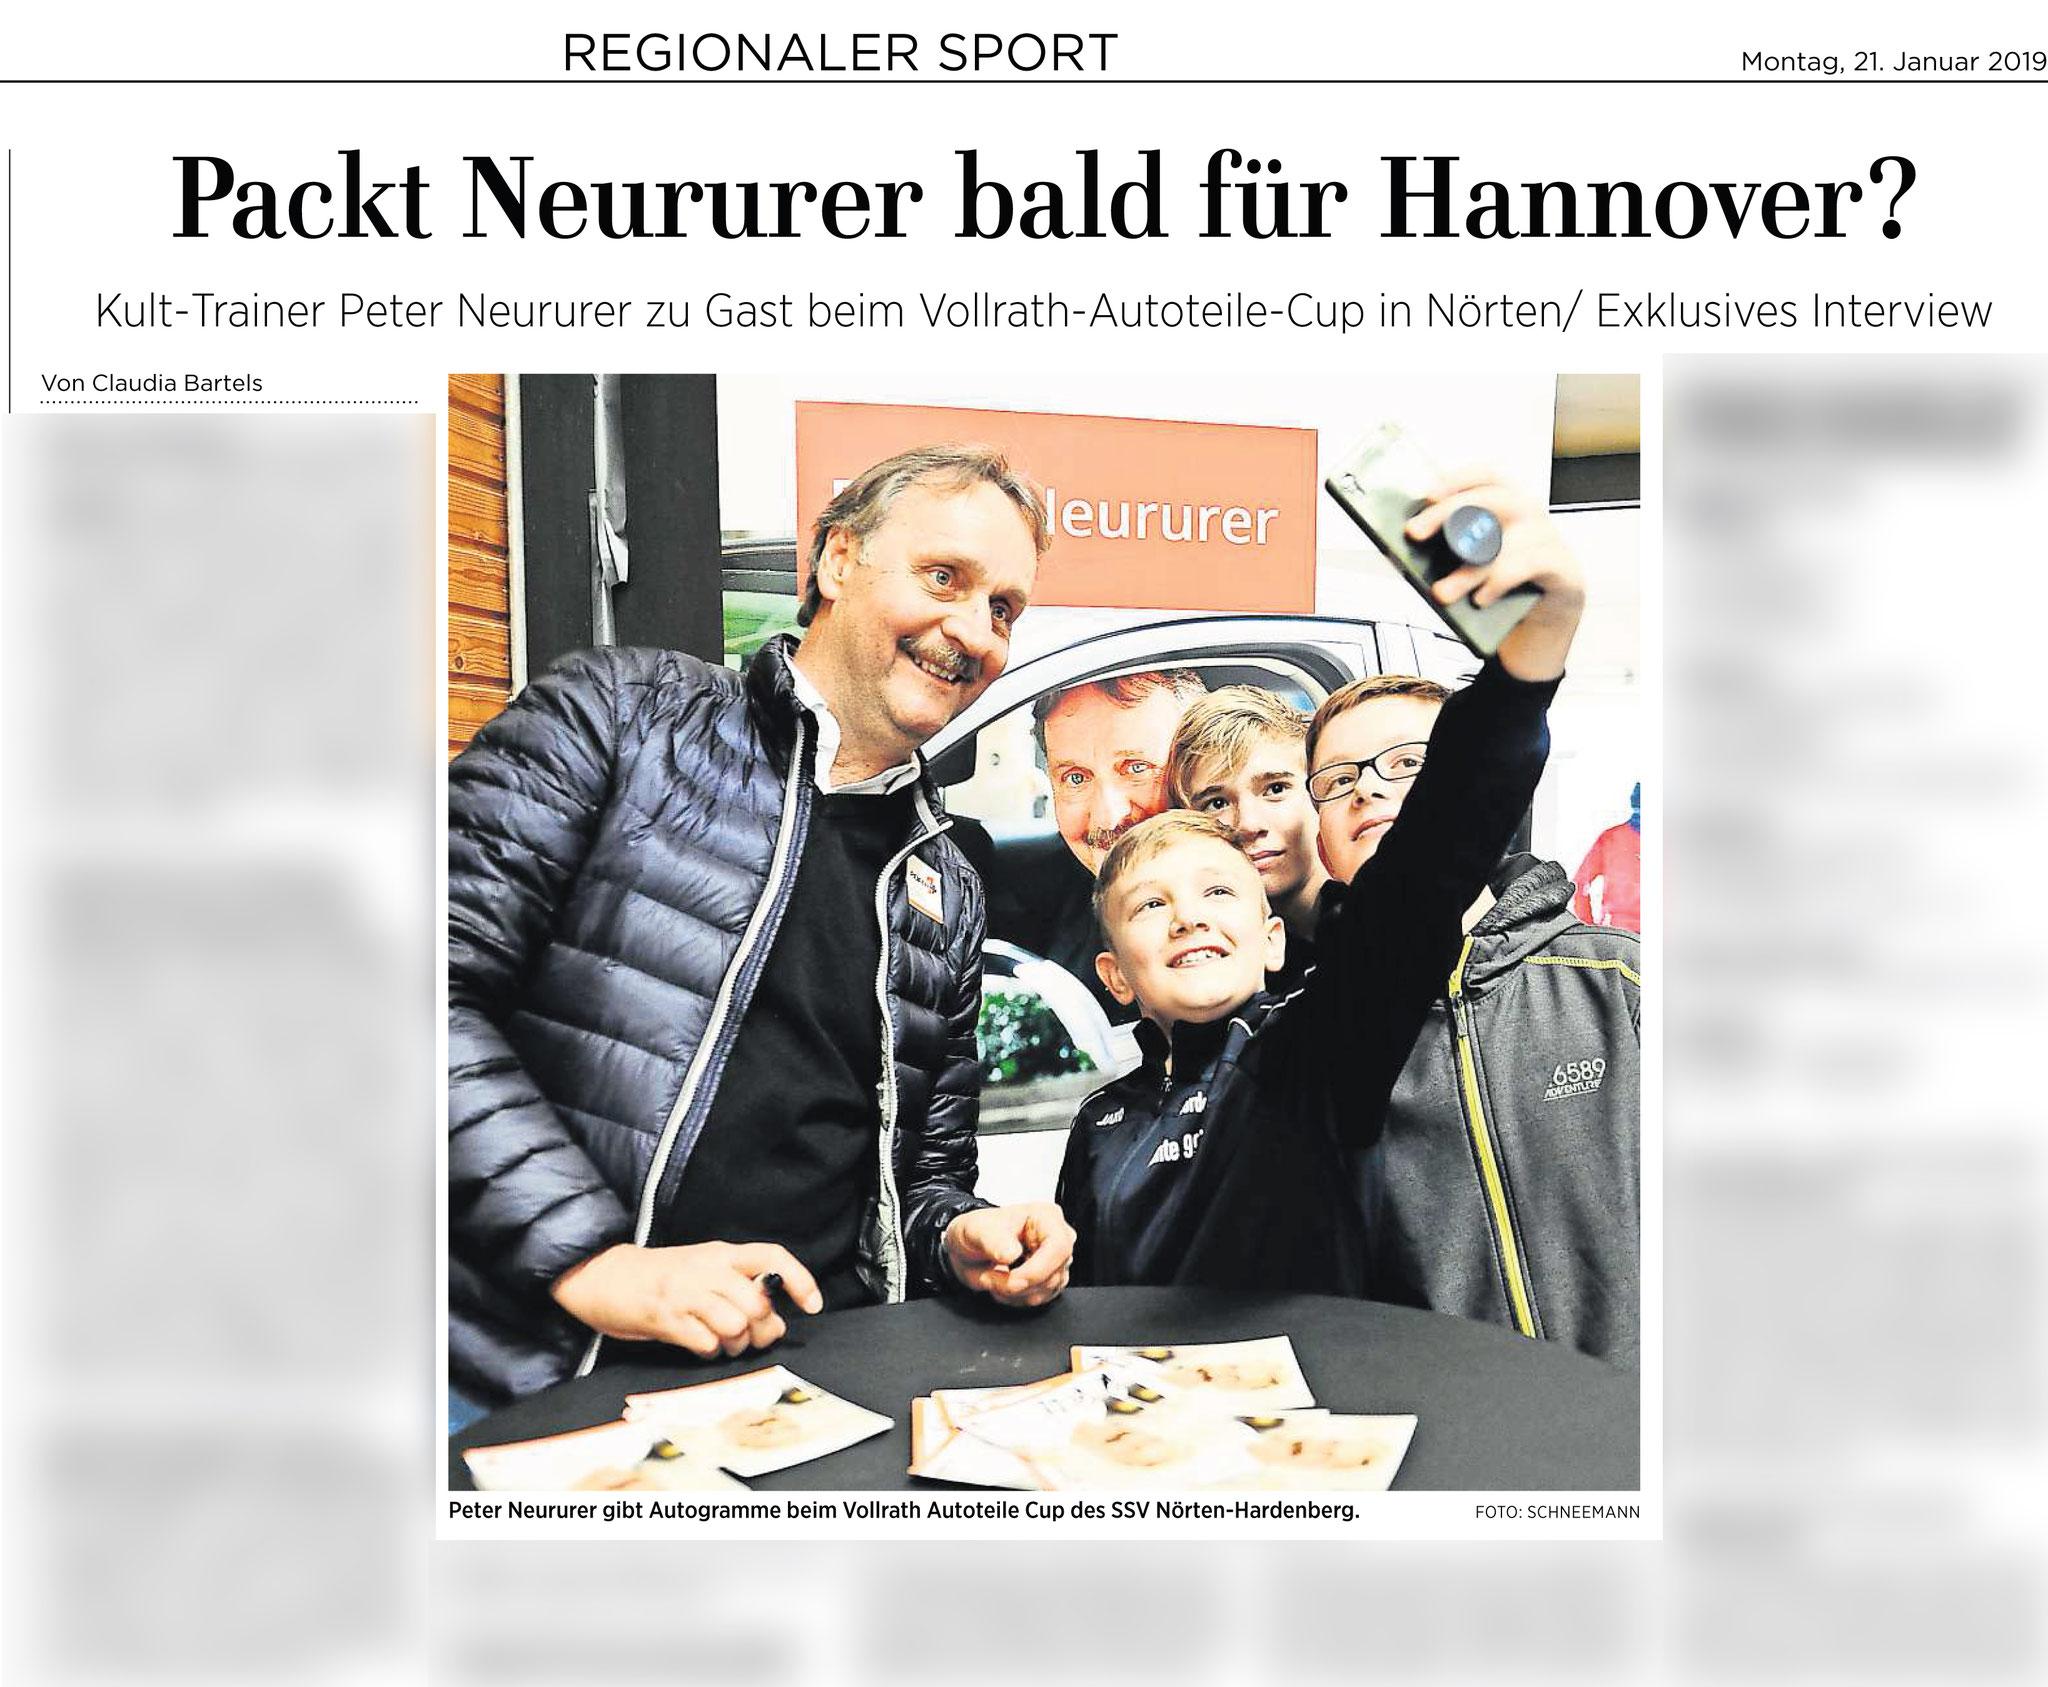 Göttinger Tageblatt 21.01.2019. Profitrainer Peter Neururer gibt Autogramme in Nörten